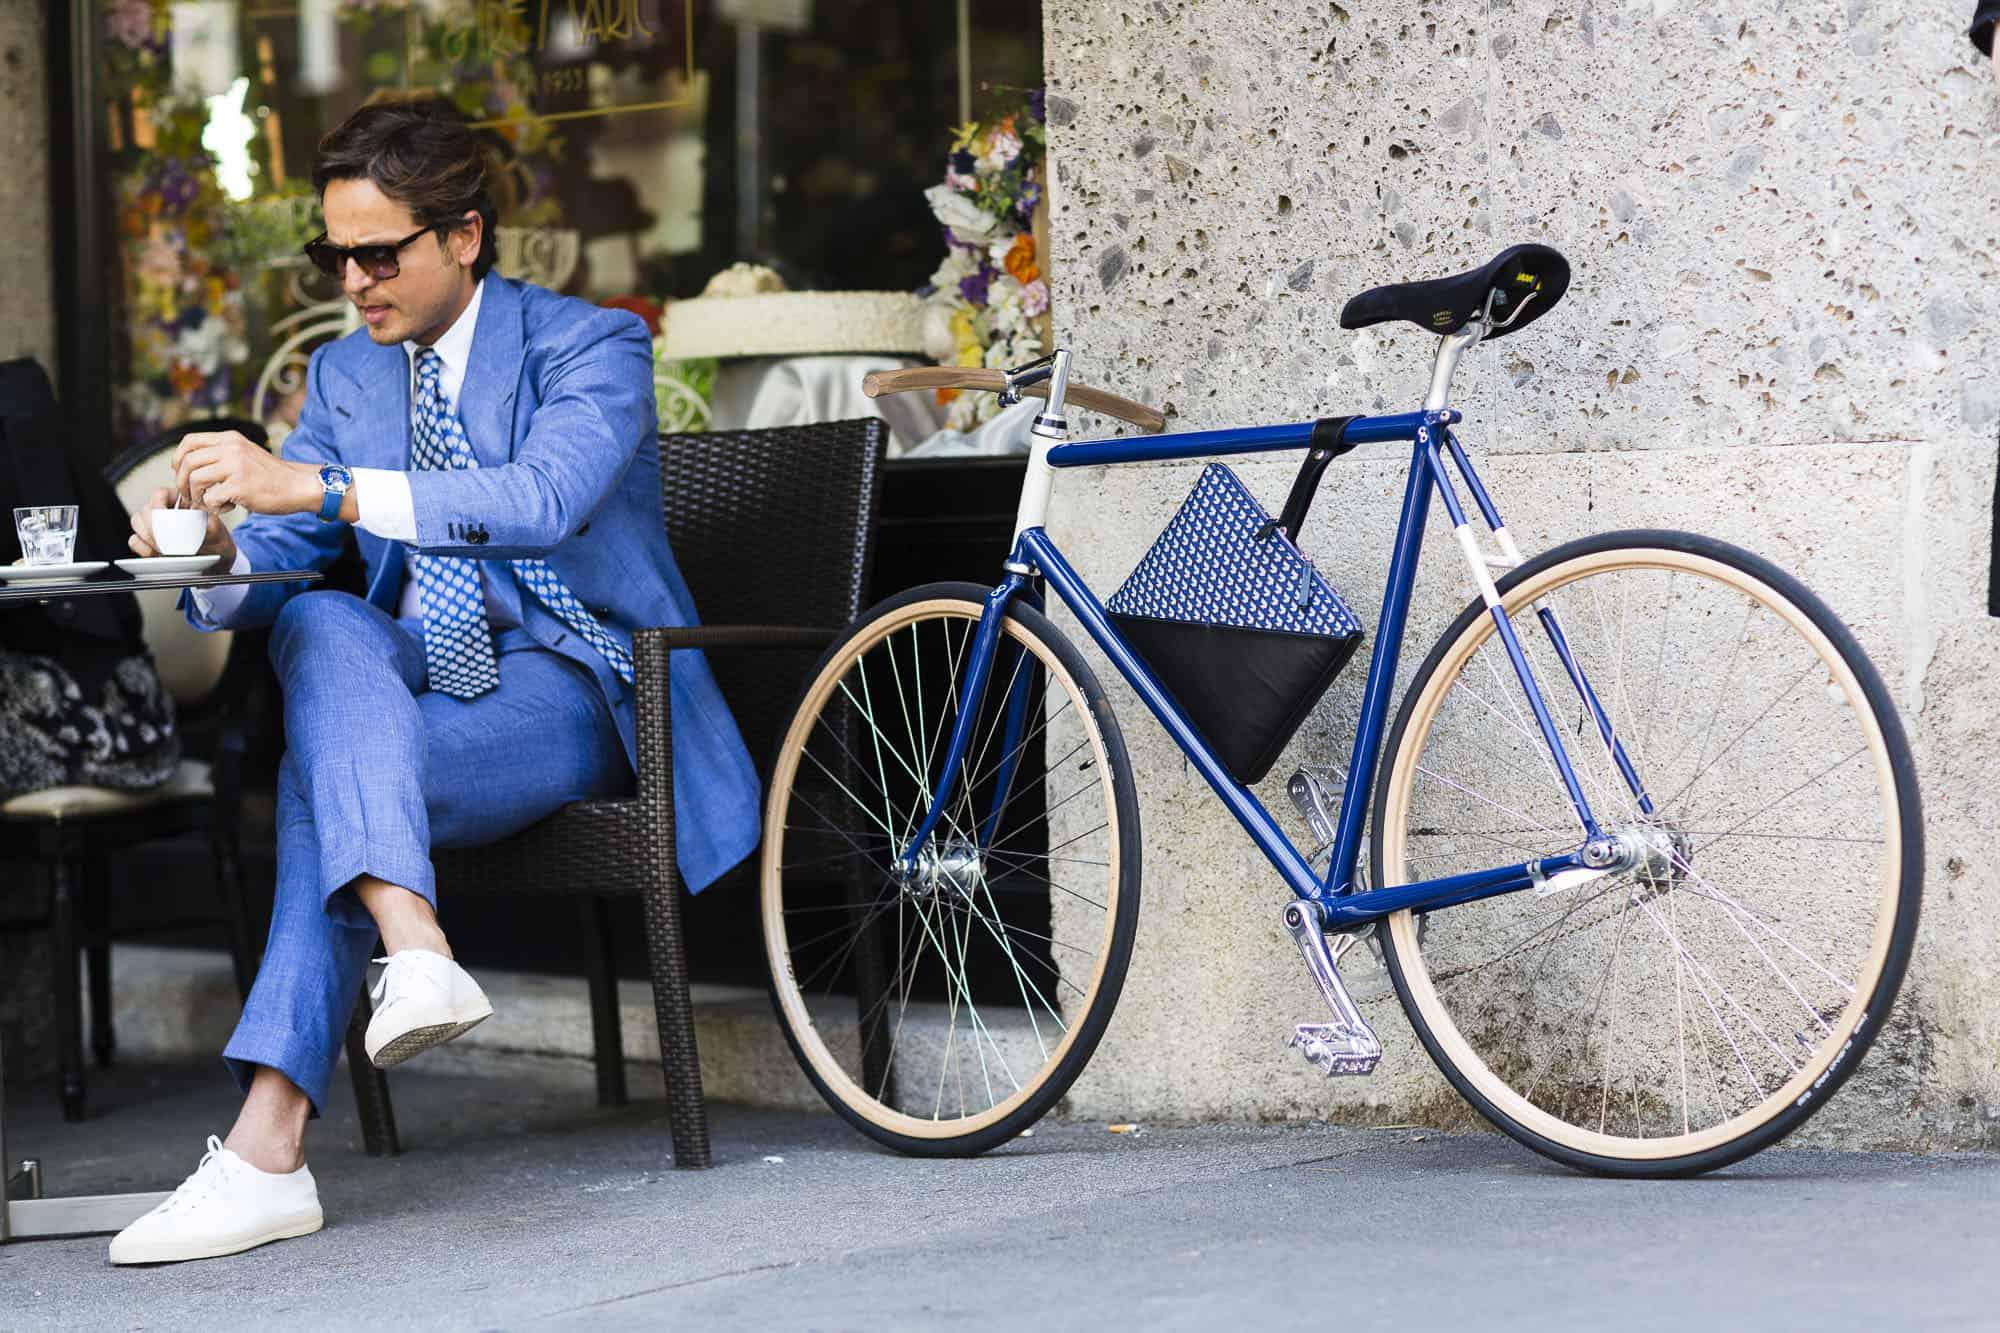 Jaiperdumaveste_Nabile-Quenum_StreetStyle_Milan-FashionWeek-Spring-Summer-2016_-7547-1